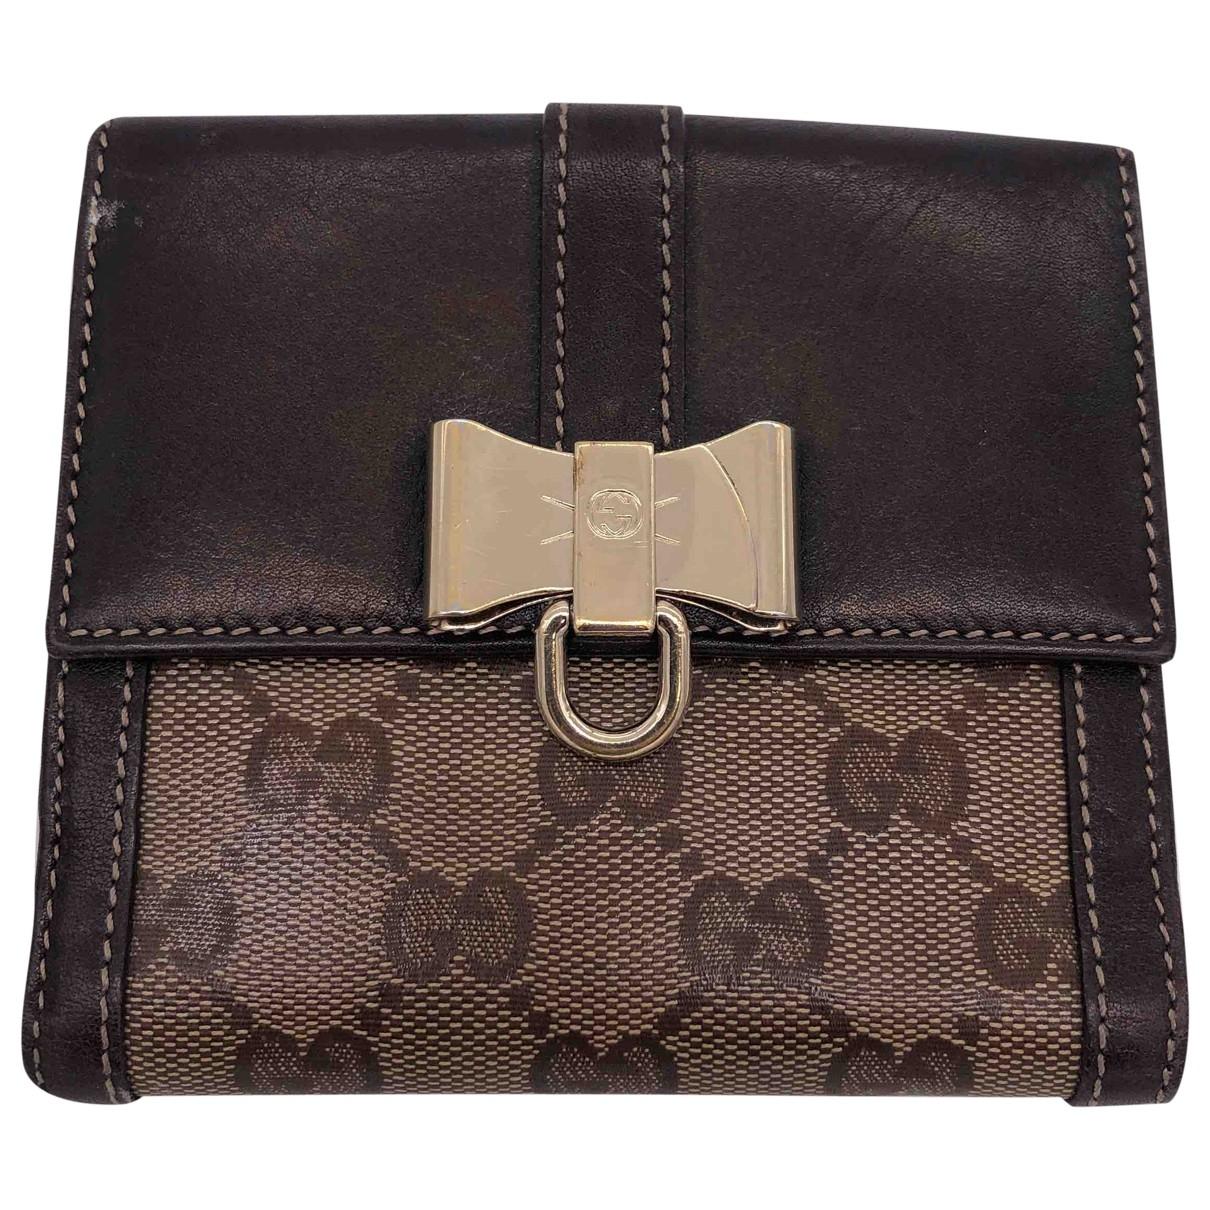 Gucci \N Brown Cloth wallet for Women \N